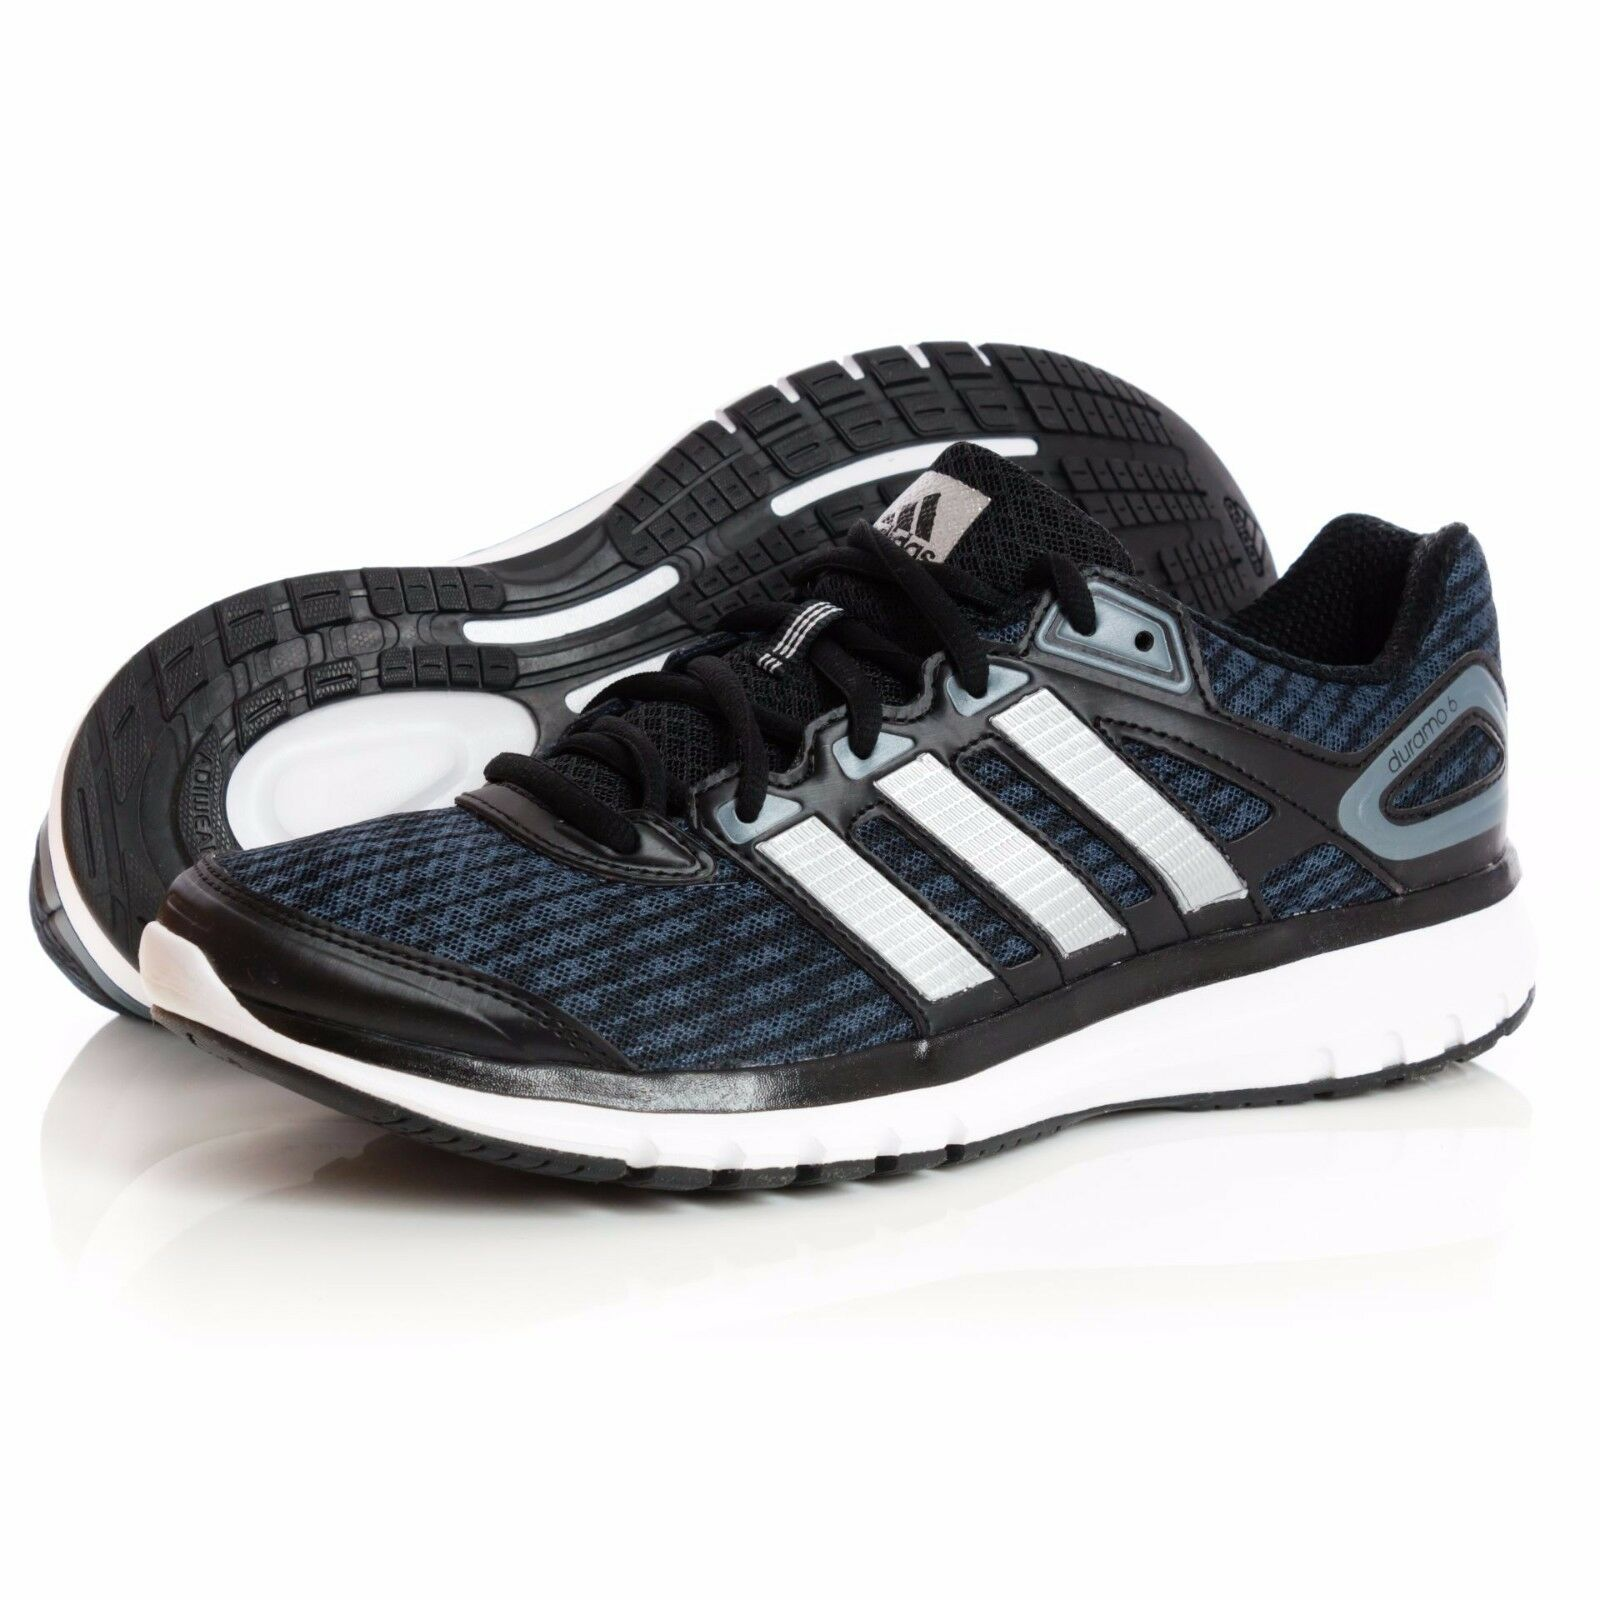 ADIDAS Duramo 6 size 7 *NEW* Black Grey Running Shoes Adiwear ADIPRENE LAST PAIR